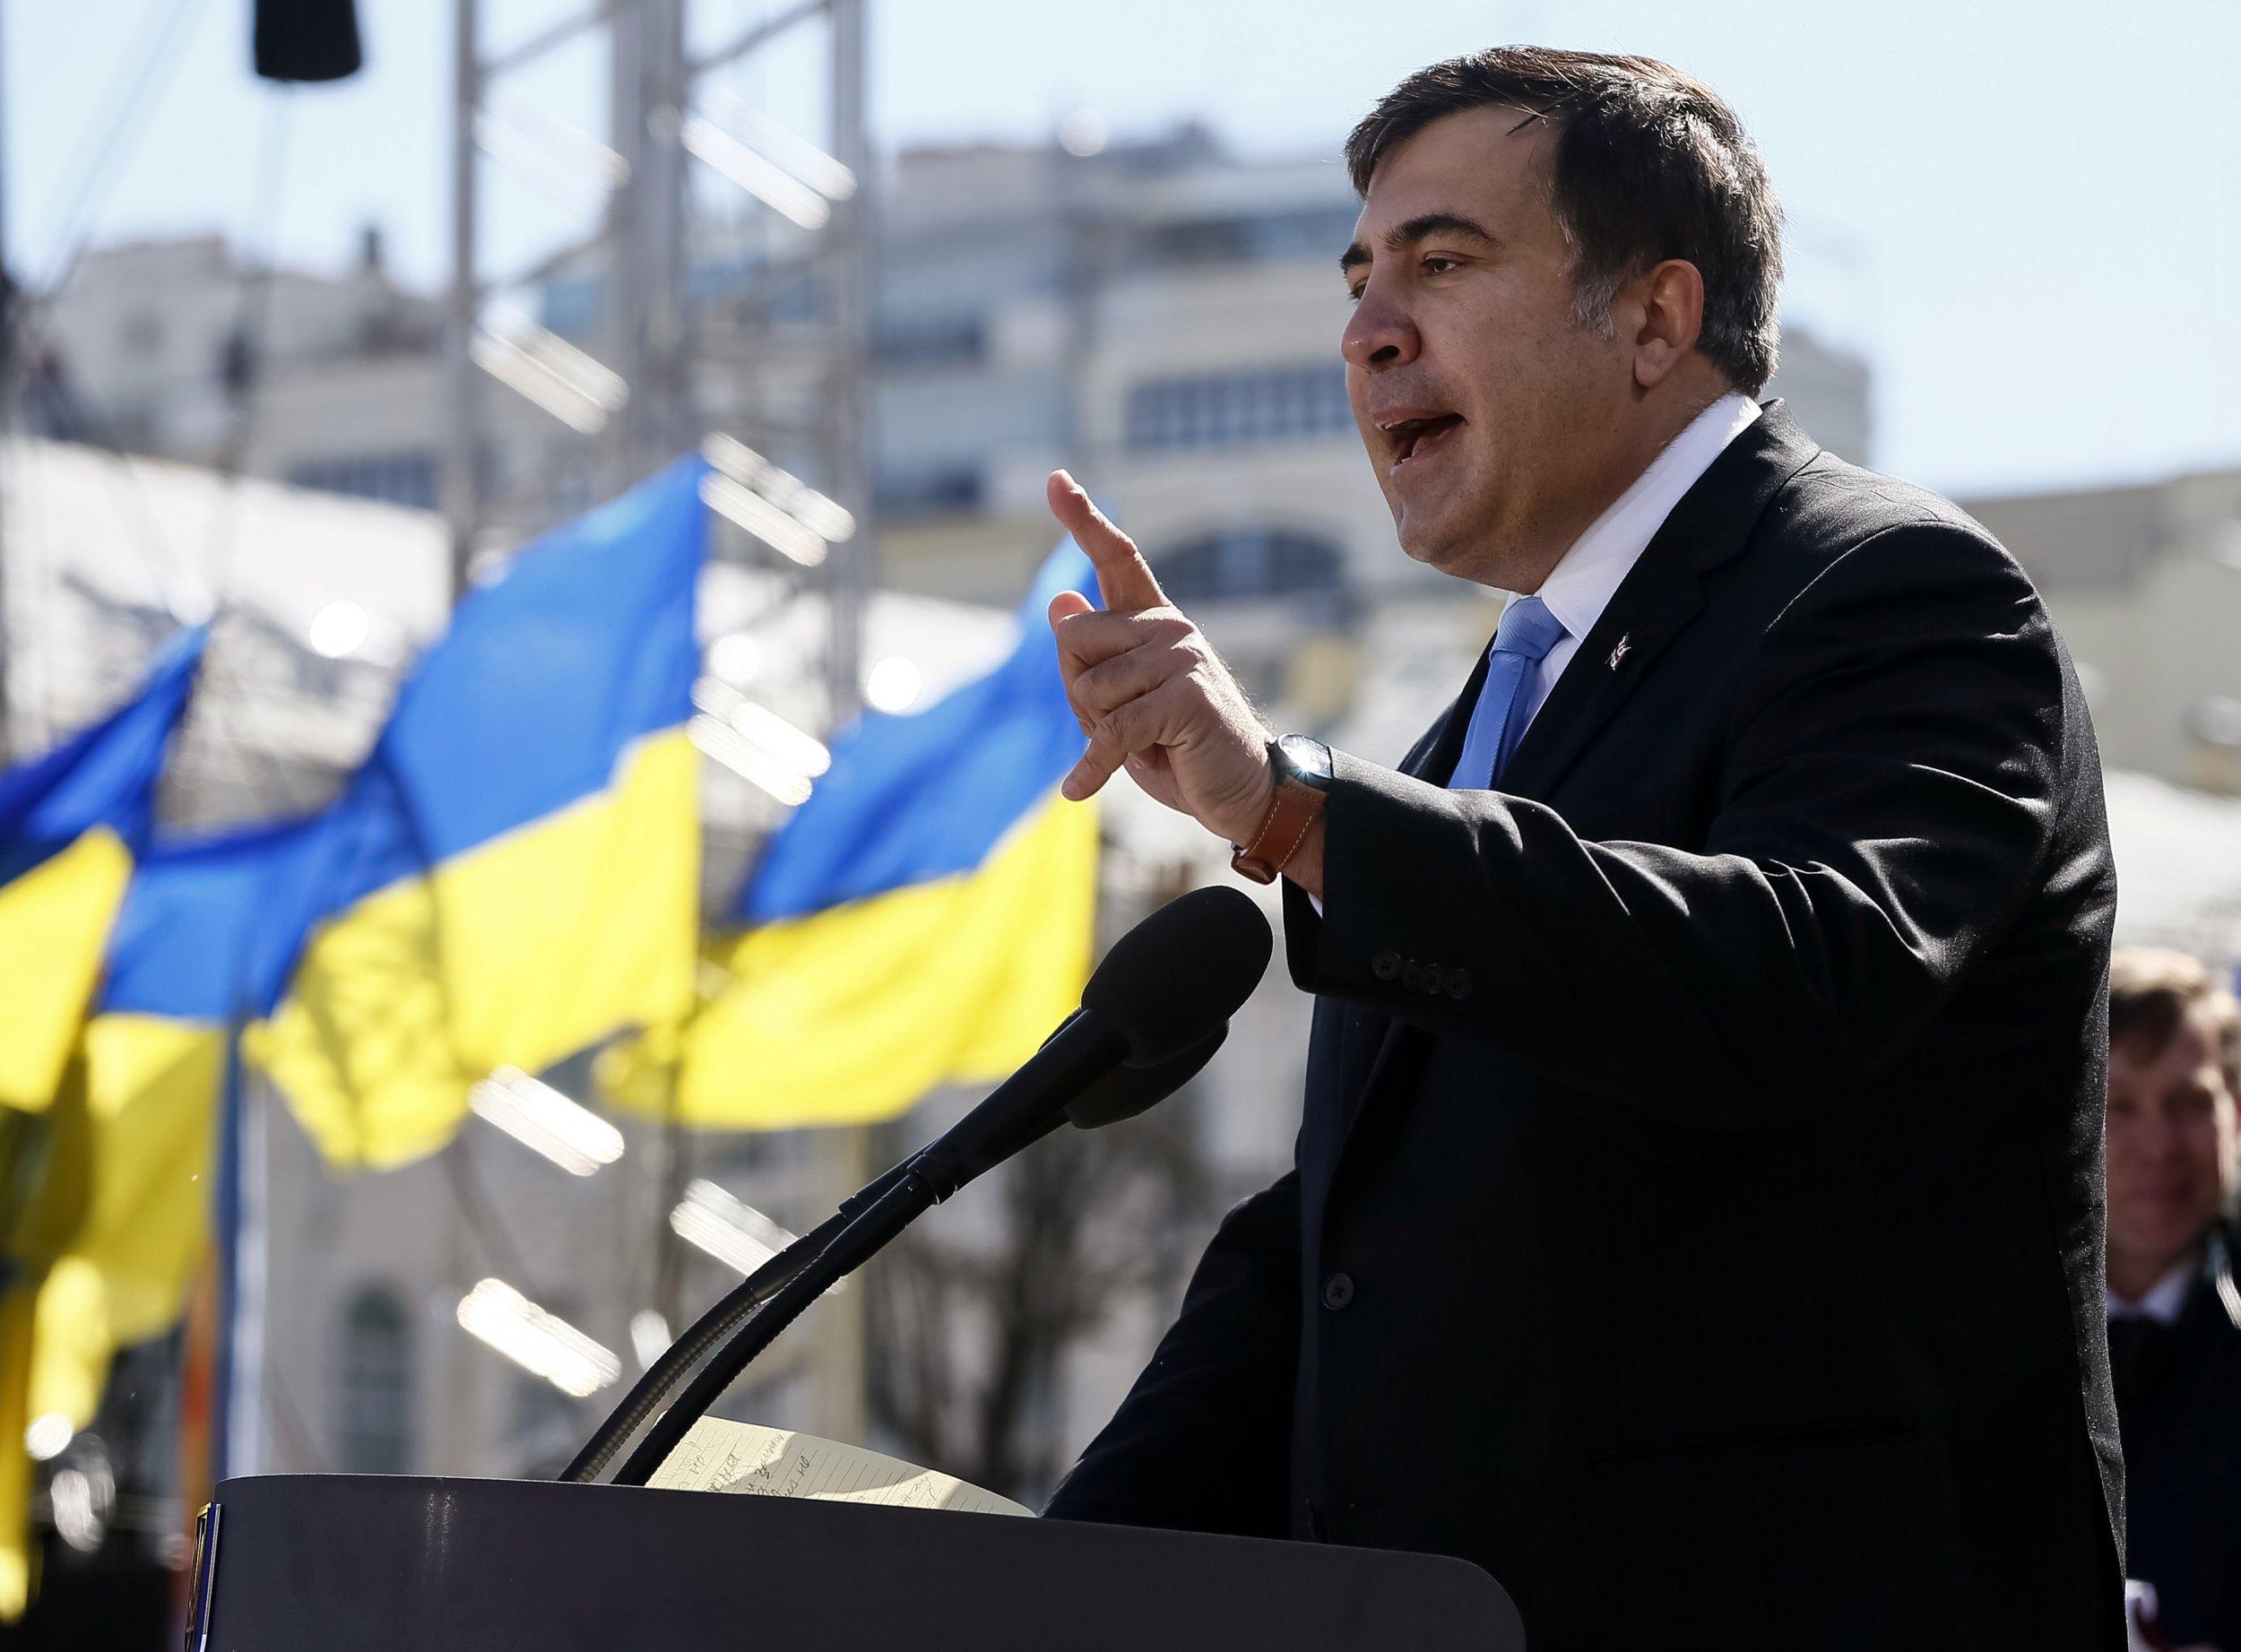 Mikhail Saakashvili in Ukraine